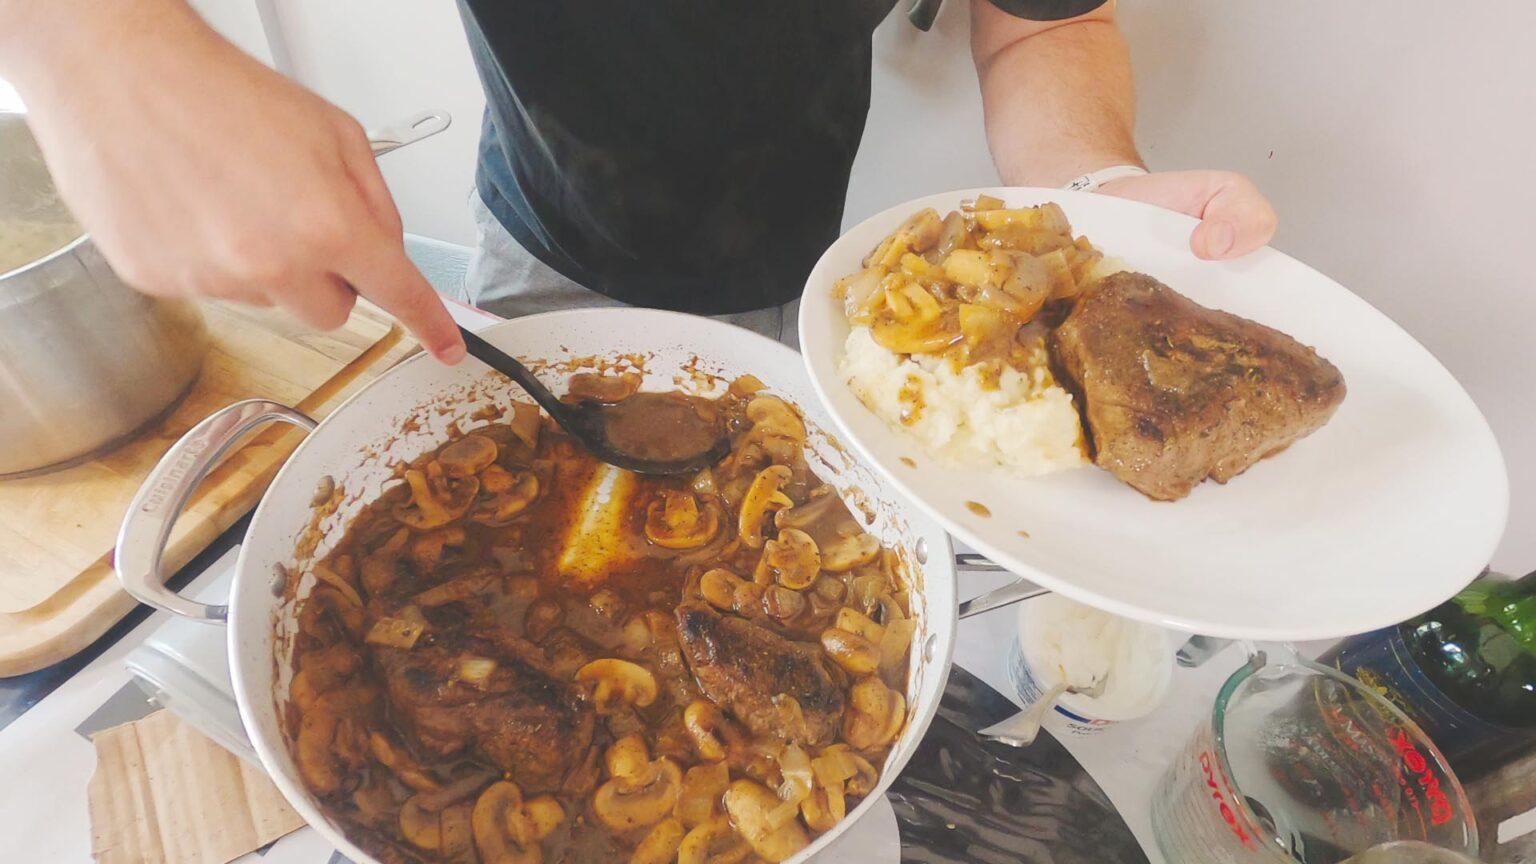 Image of mashed potatoes and madeira steak